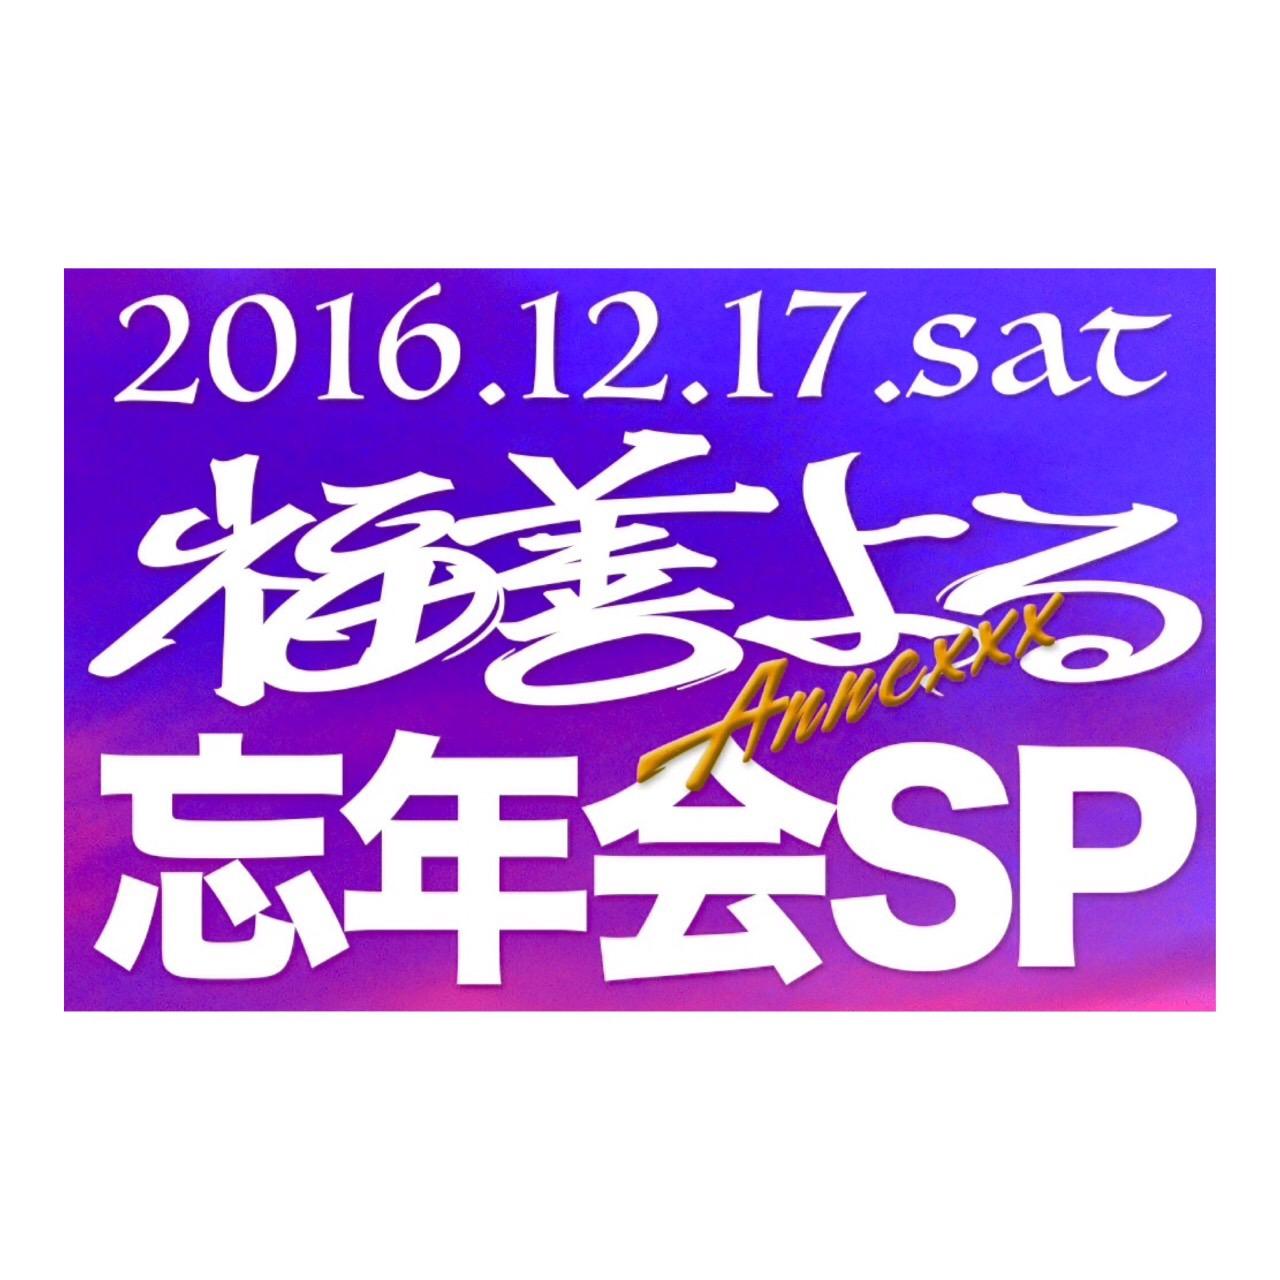 12/17(sat) 福善よるANNEX-忘年会SP- @ 三宿Web_a0262614_20315387.jpg